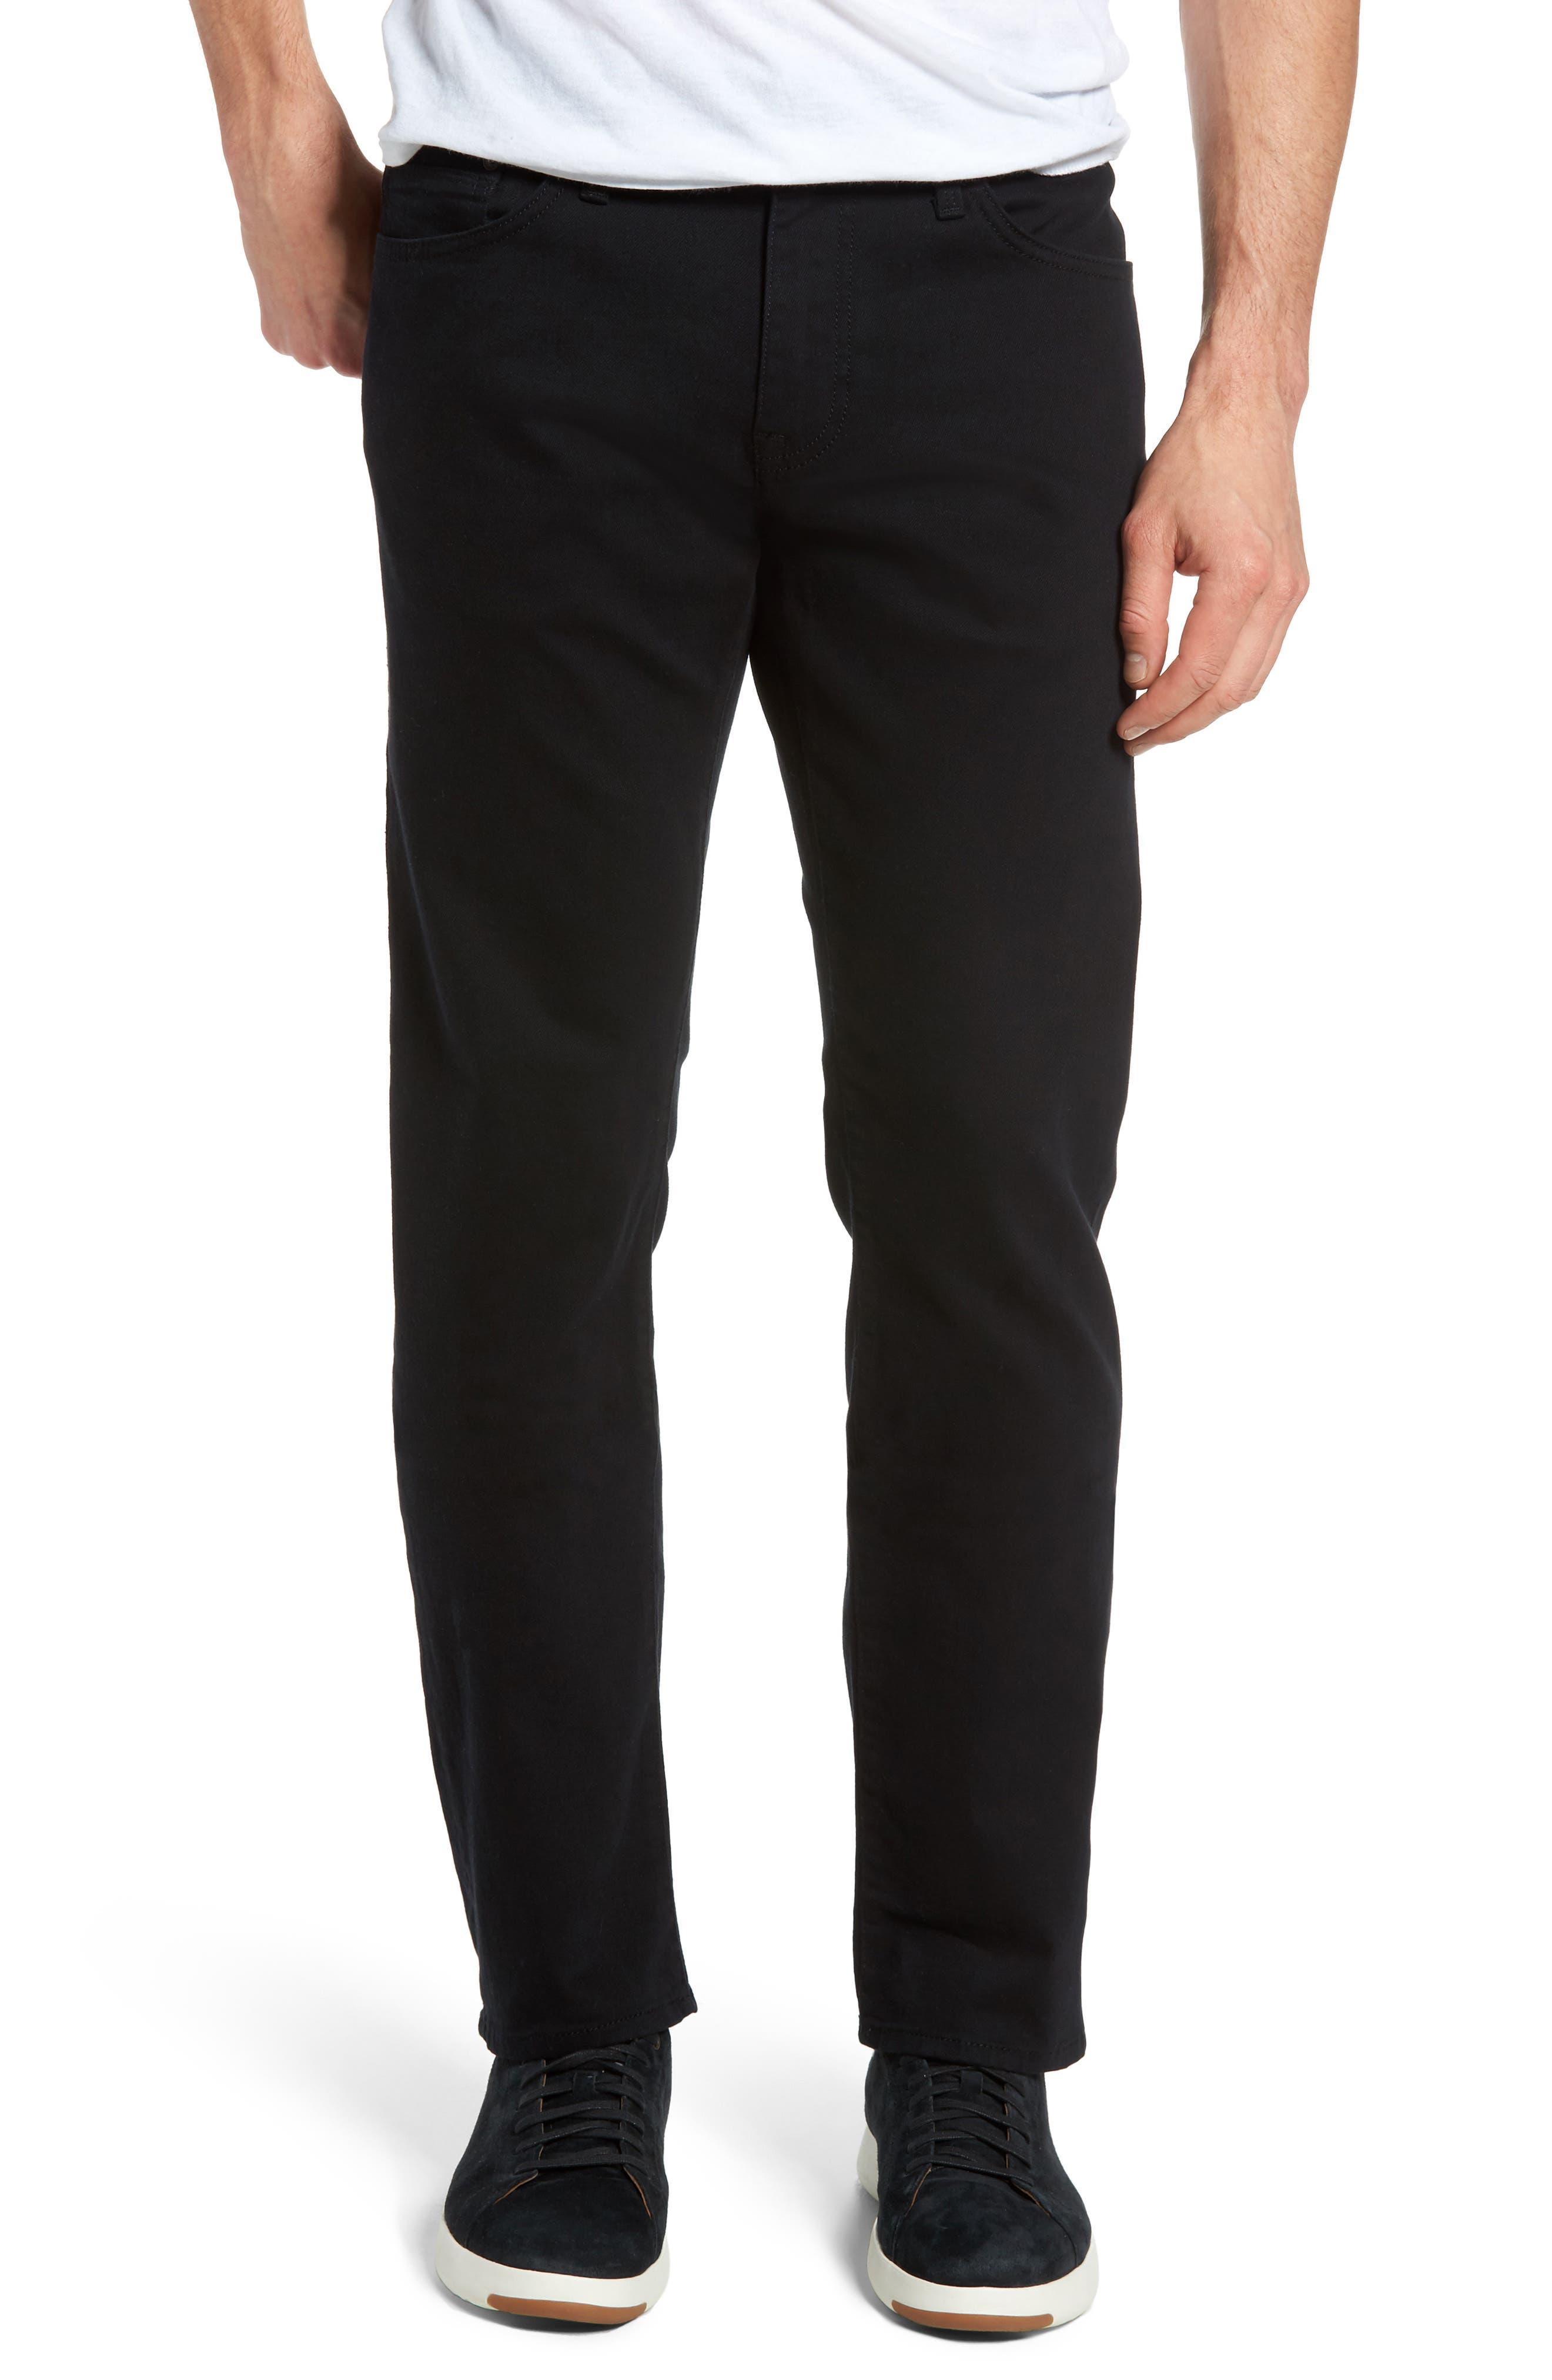 Alternate Image 1 Selected - Mavi Jeans Zach Straight Leg Jeans (Black Williamsburg)